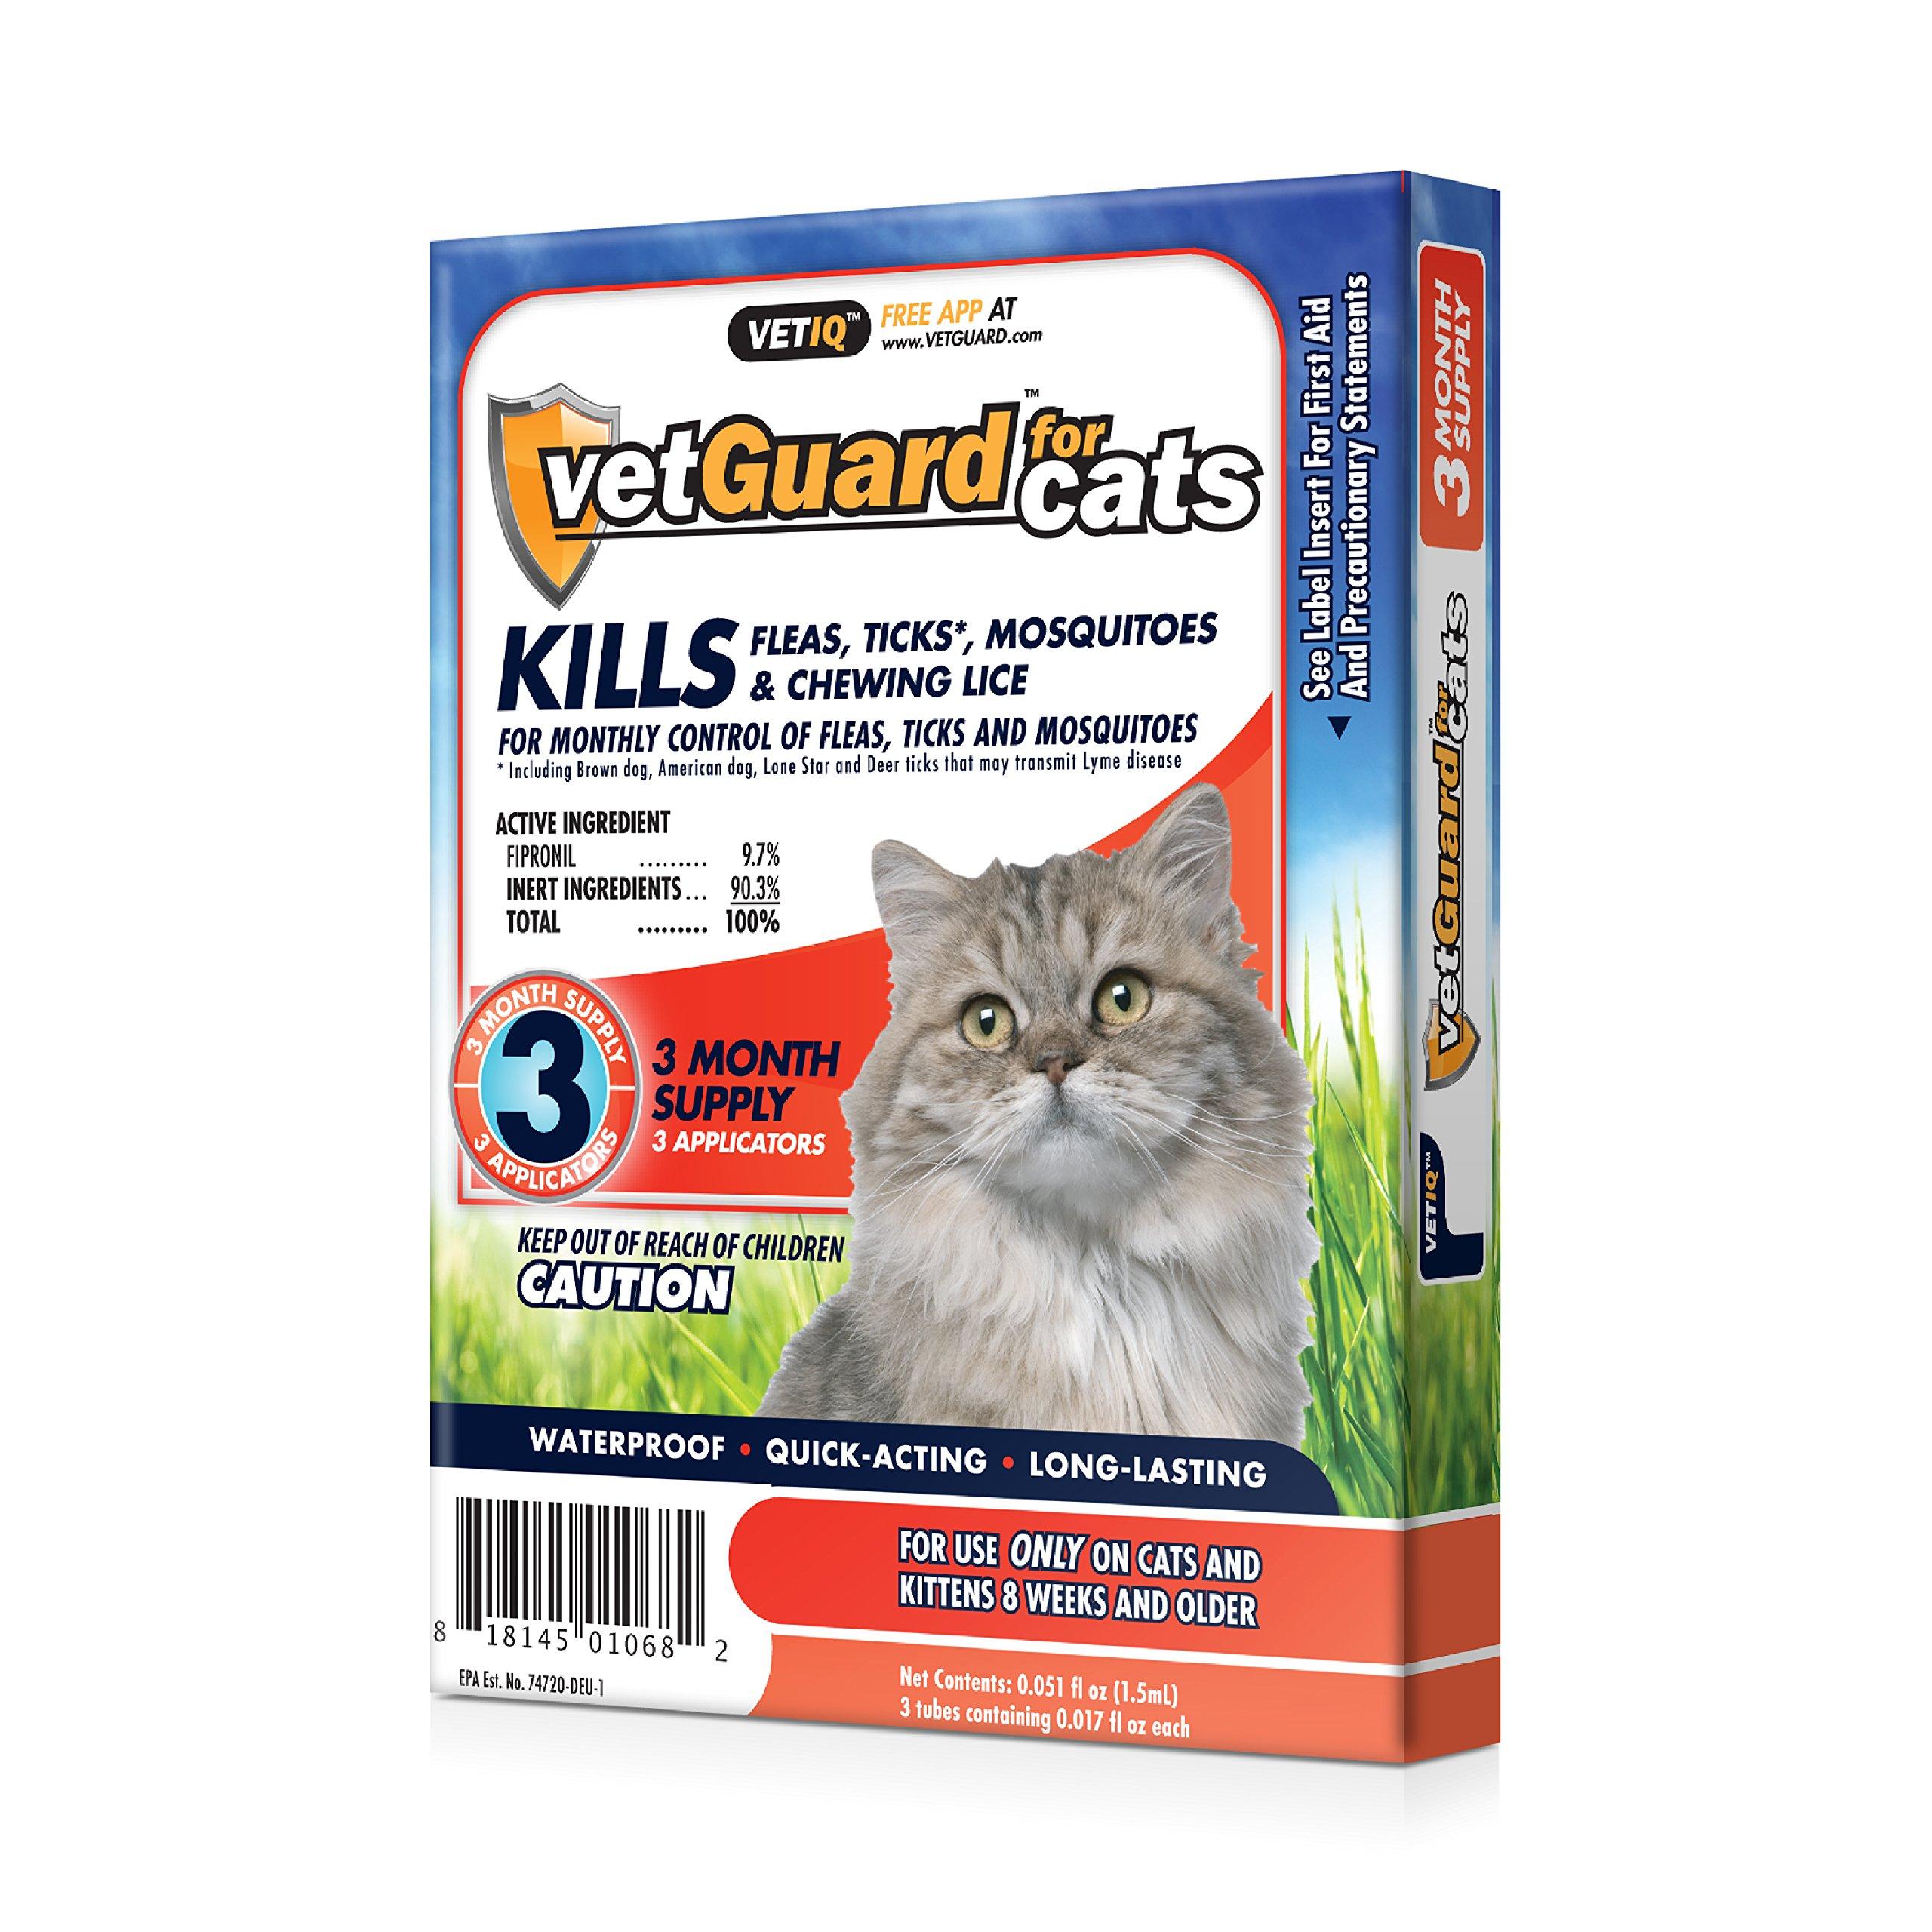 VetGuard Plus Flea & Tick Treatment Cats,, 3 Month Supply